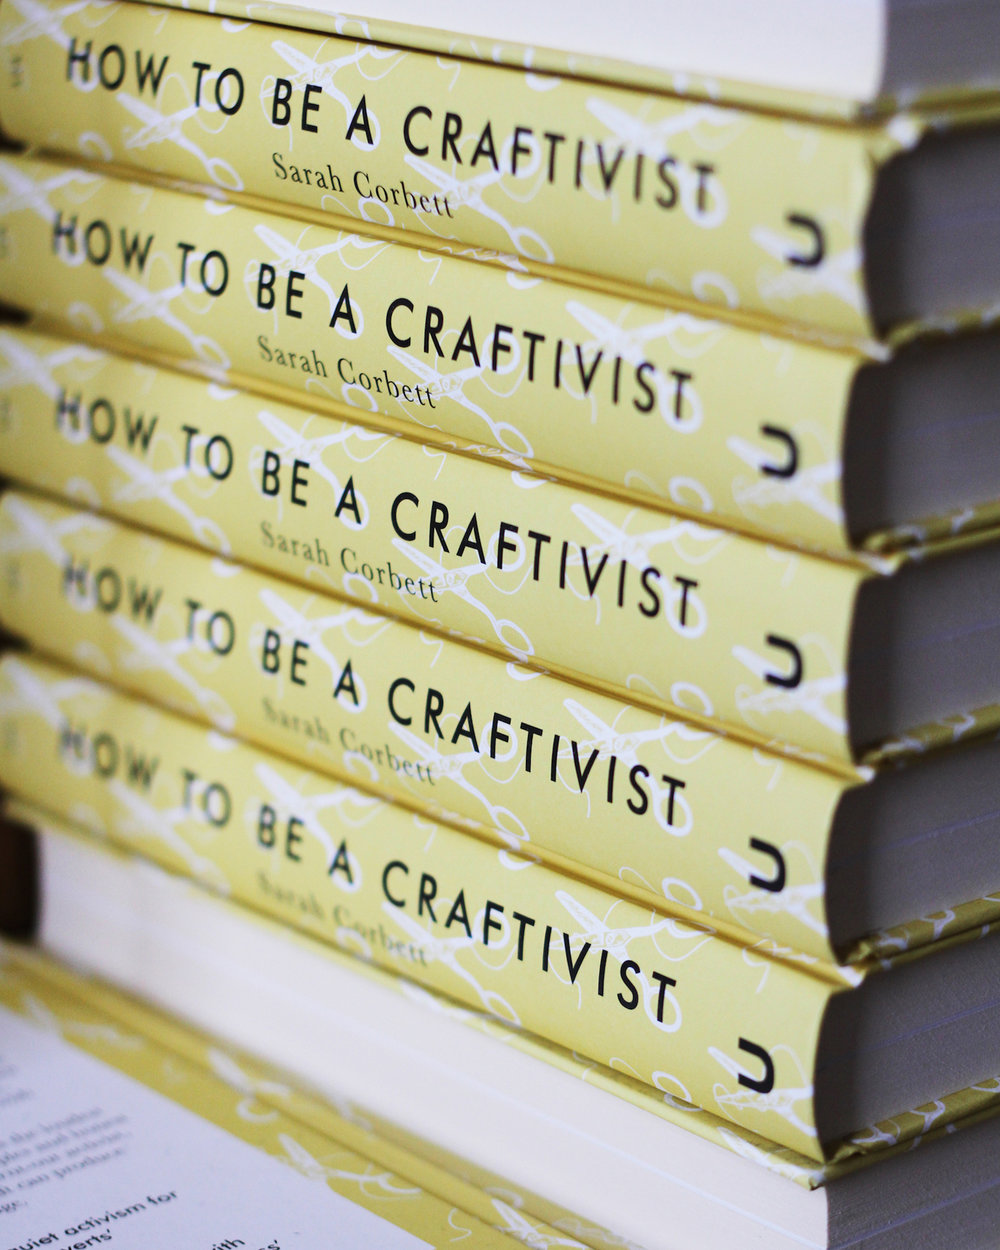 how-to-be-a-craftivist-by-sarah-corbett.jpg